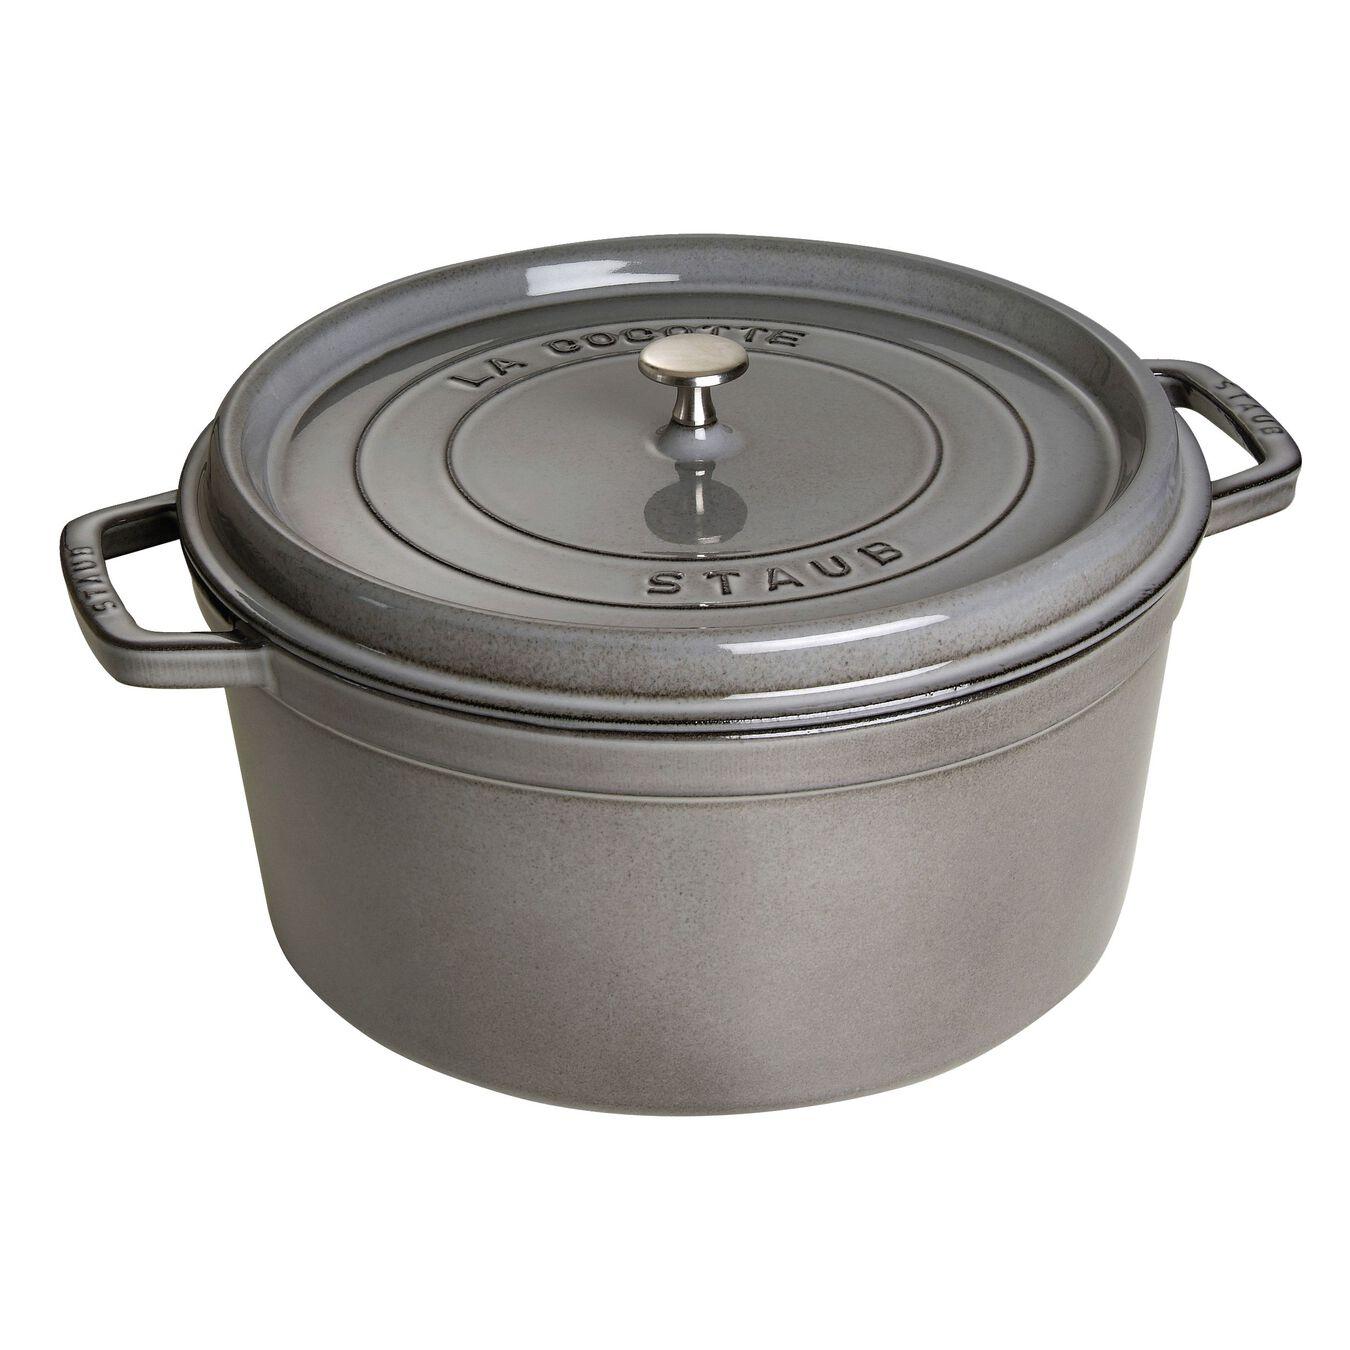 8.25 l Cast iron round Cocotte, Graphite-Grey,,large 1